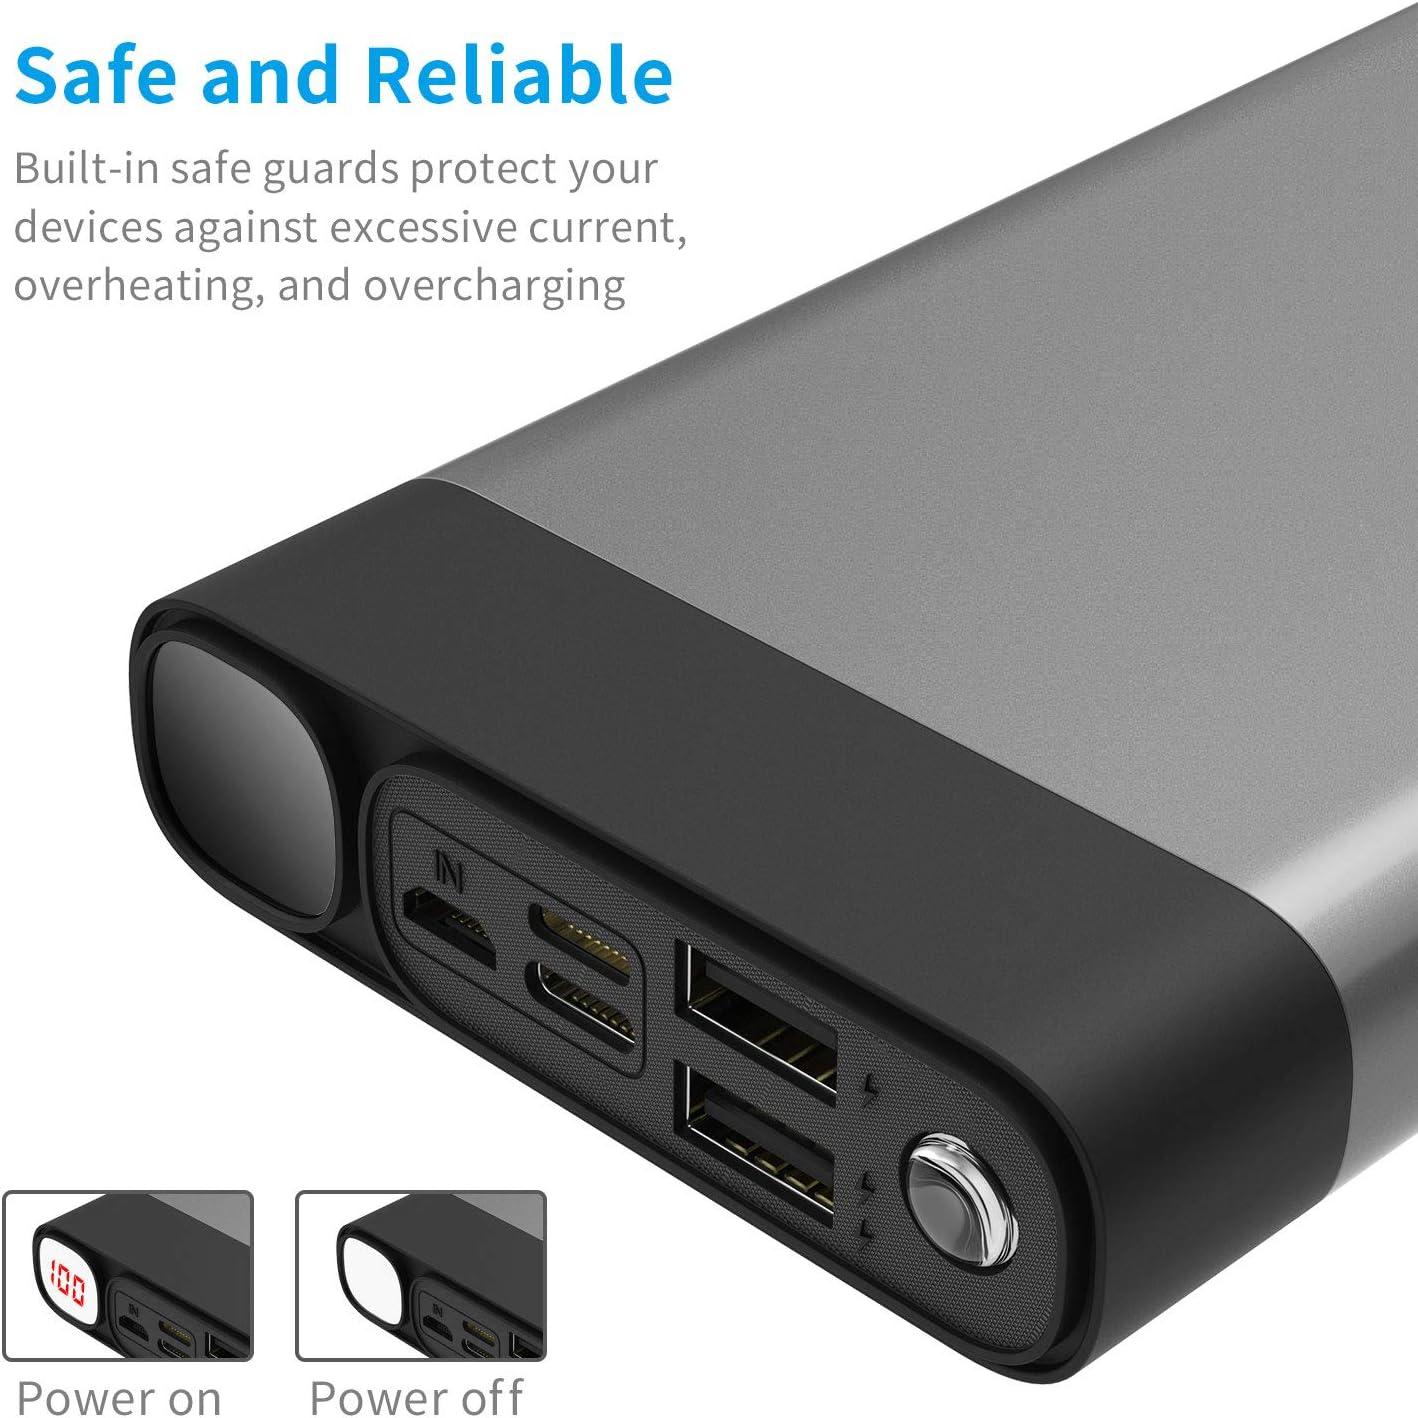 Portable Charger 30000mAh 2USB Ports/Super Bright Flashlight GRAY